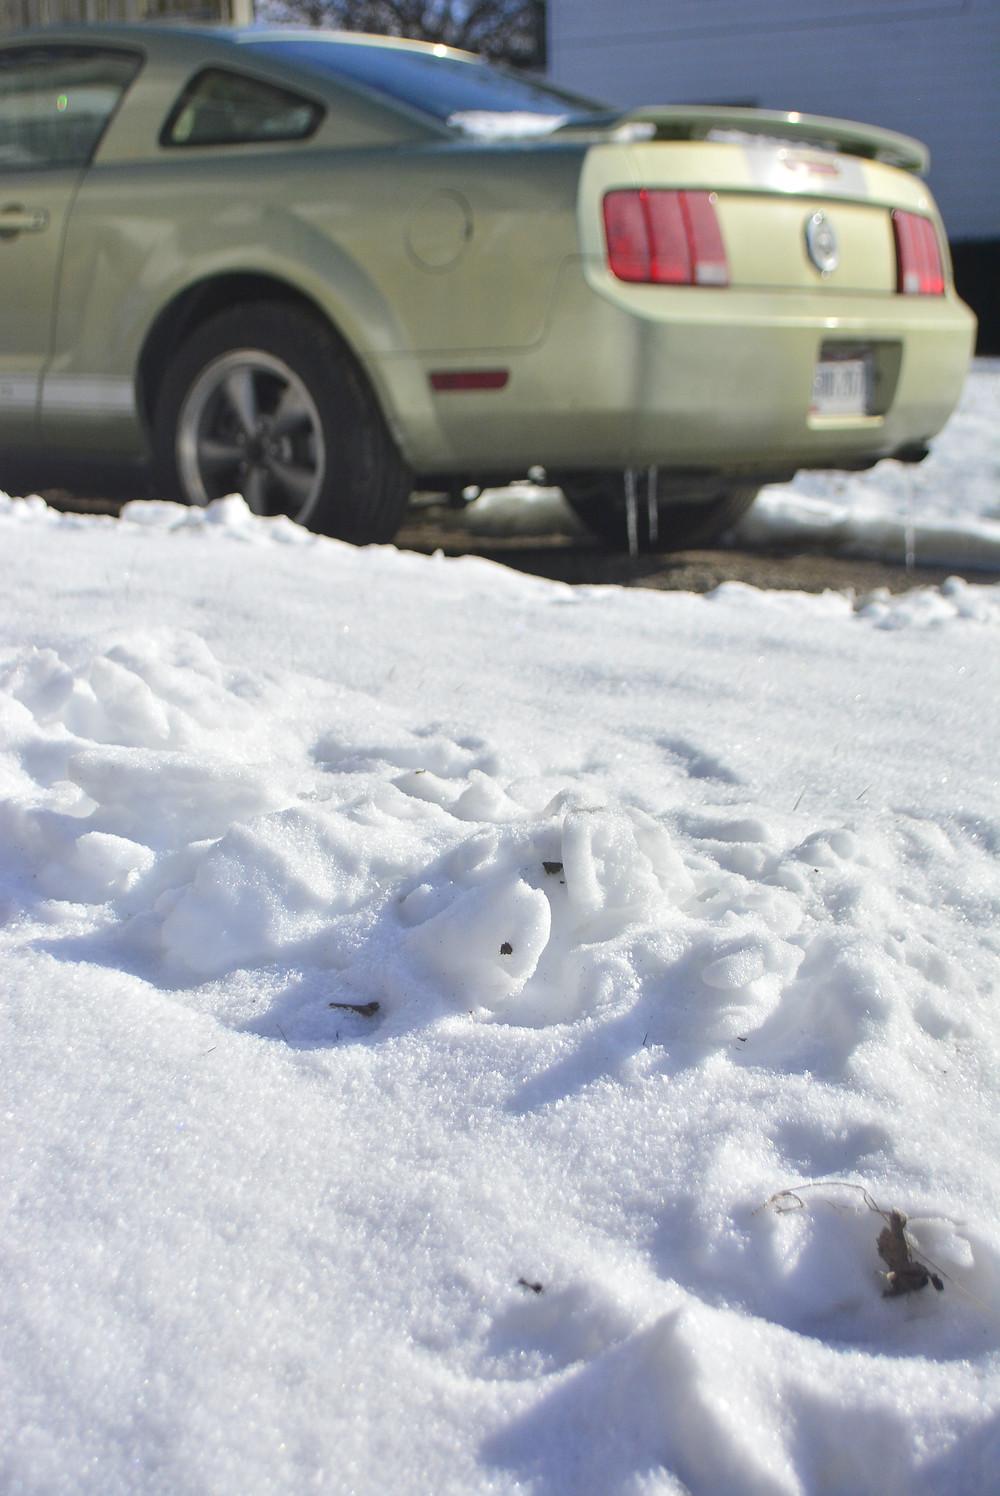 Ohio Toledo snow ice winter Mustang